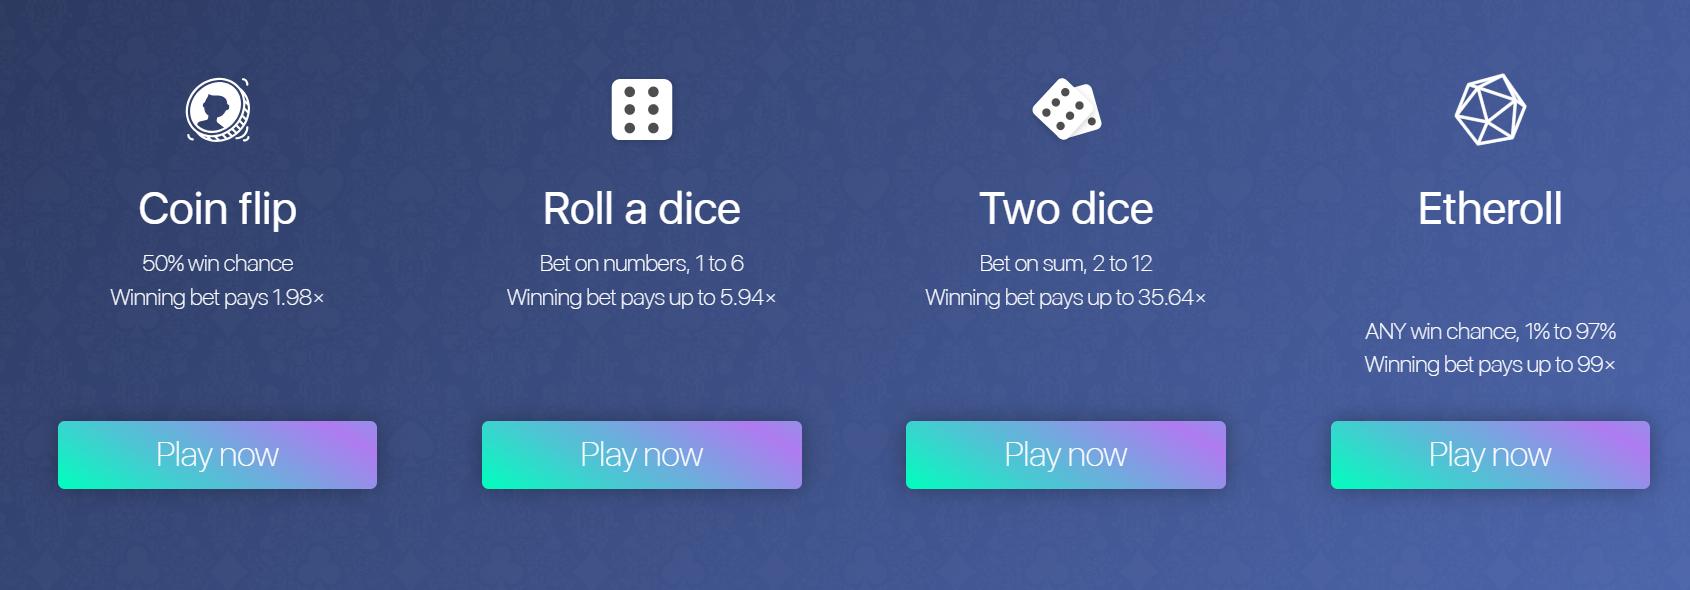 dice2win 遊び方 始め方 賭け方 やり方